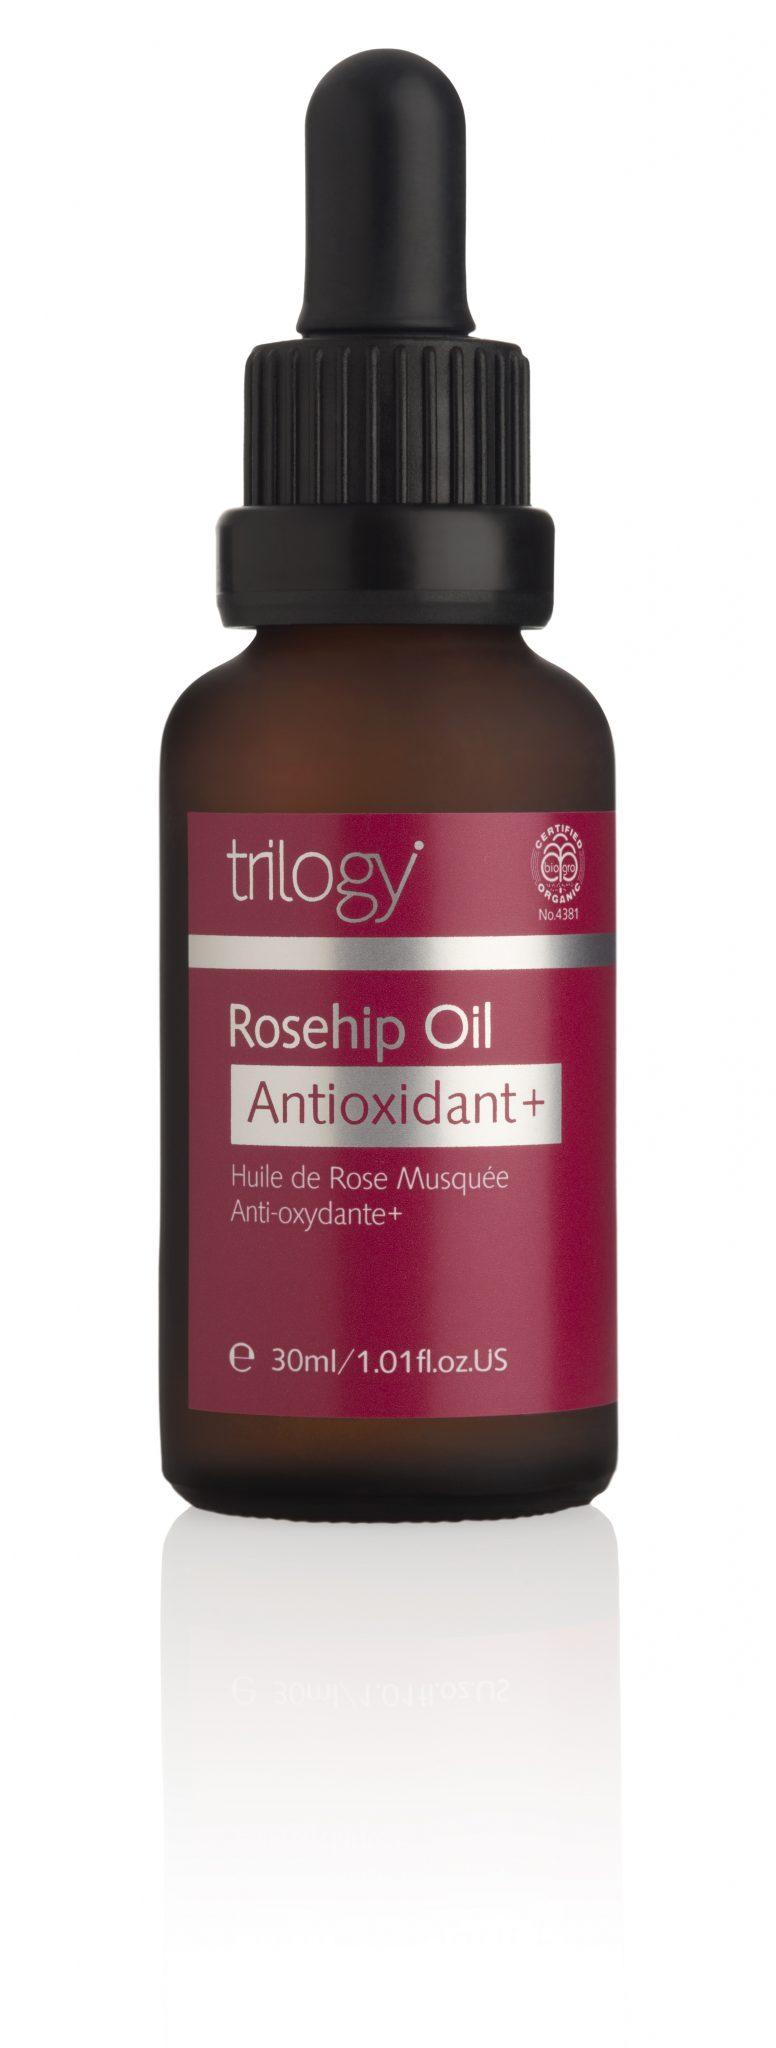 Rosehip Oil Antioxidant+